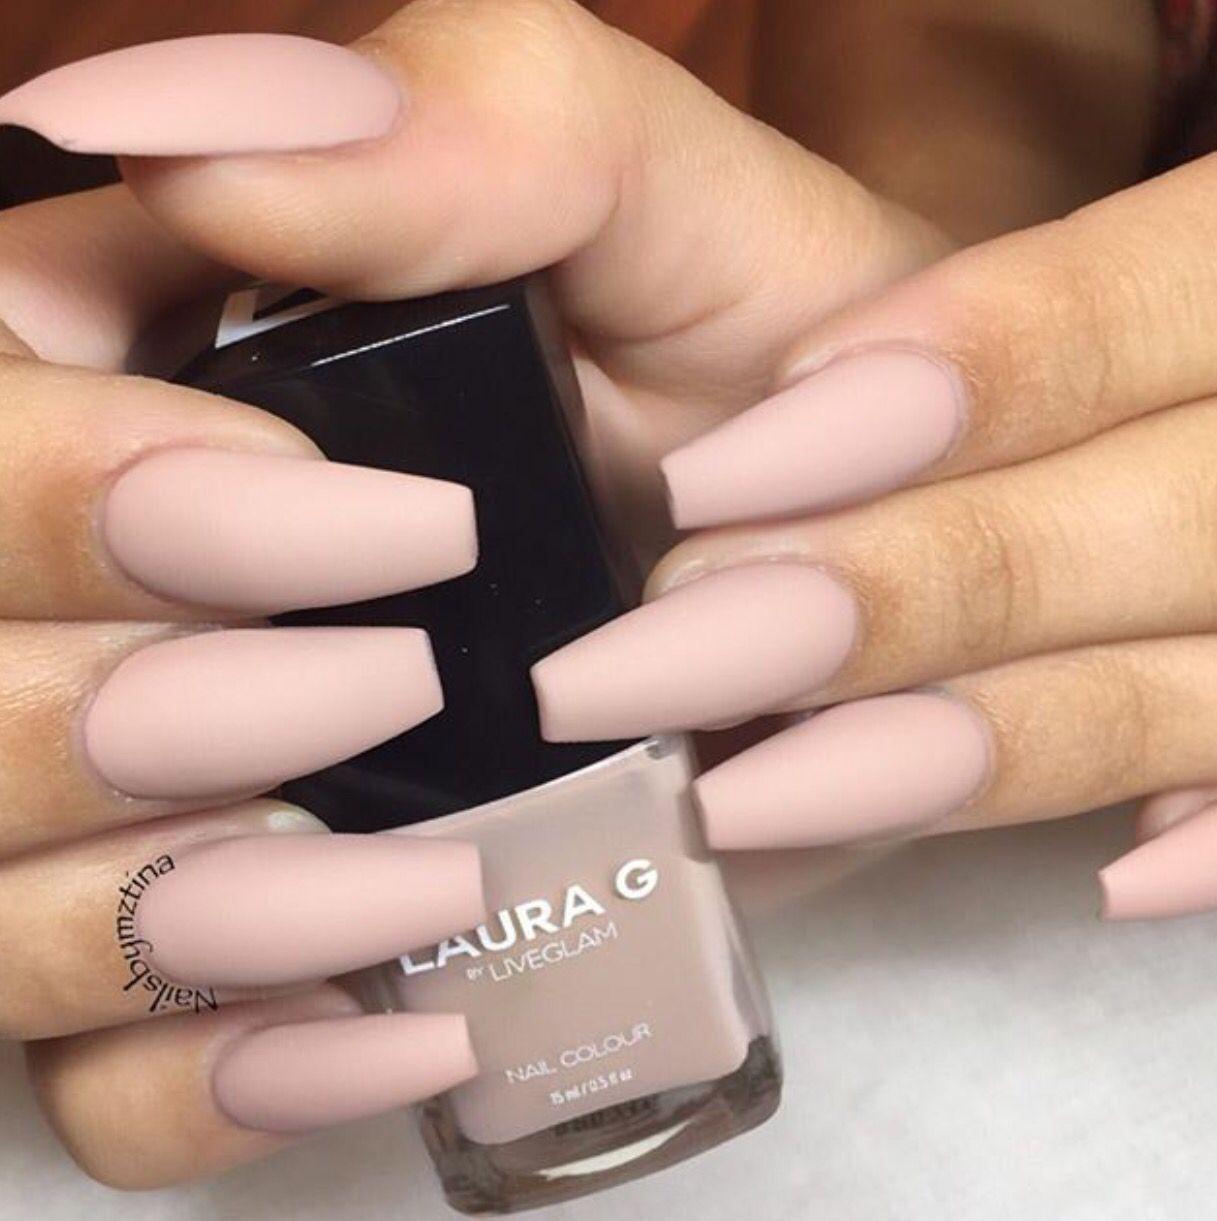 Esmalte Laura g | unhas bonitas | Pinterest | Future, Coffin nails ...